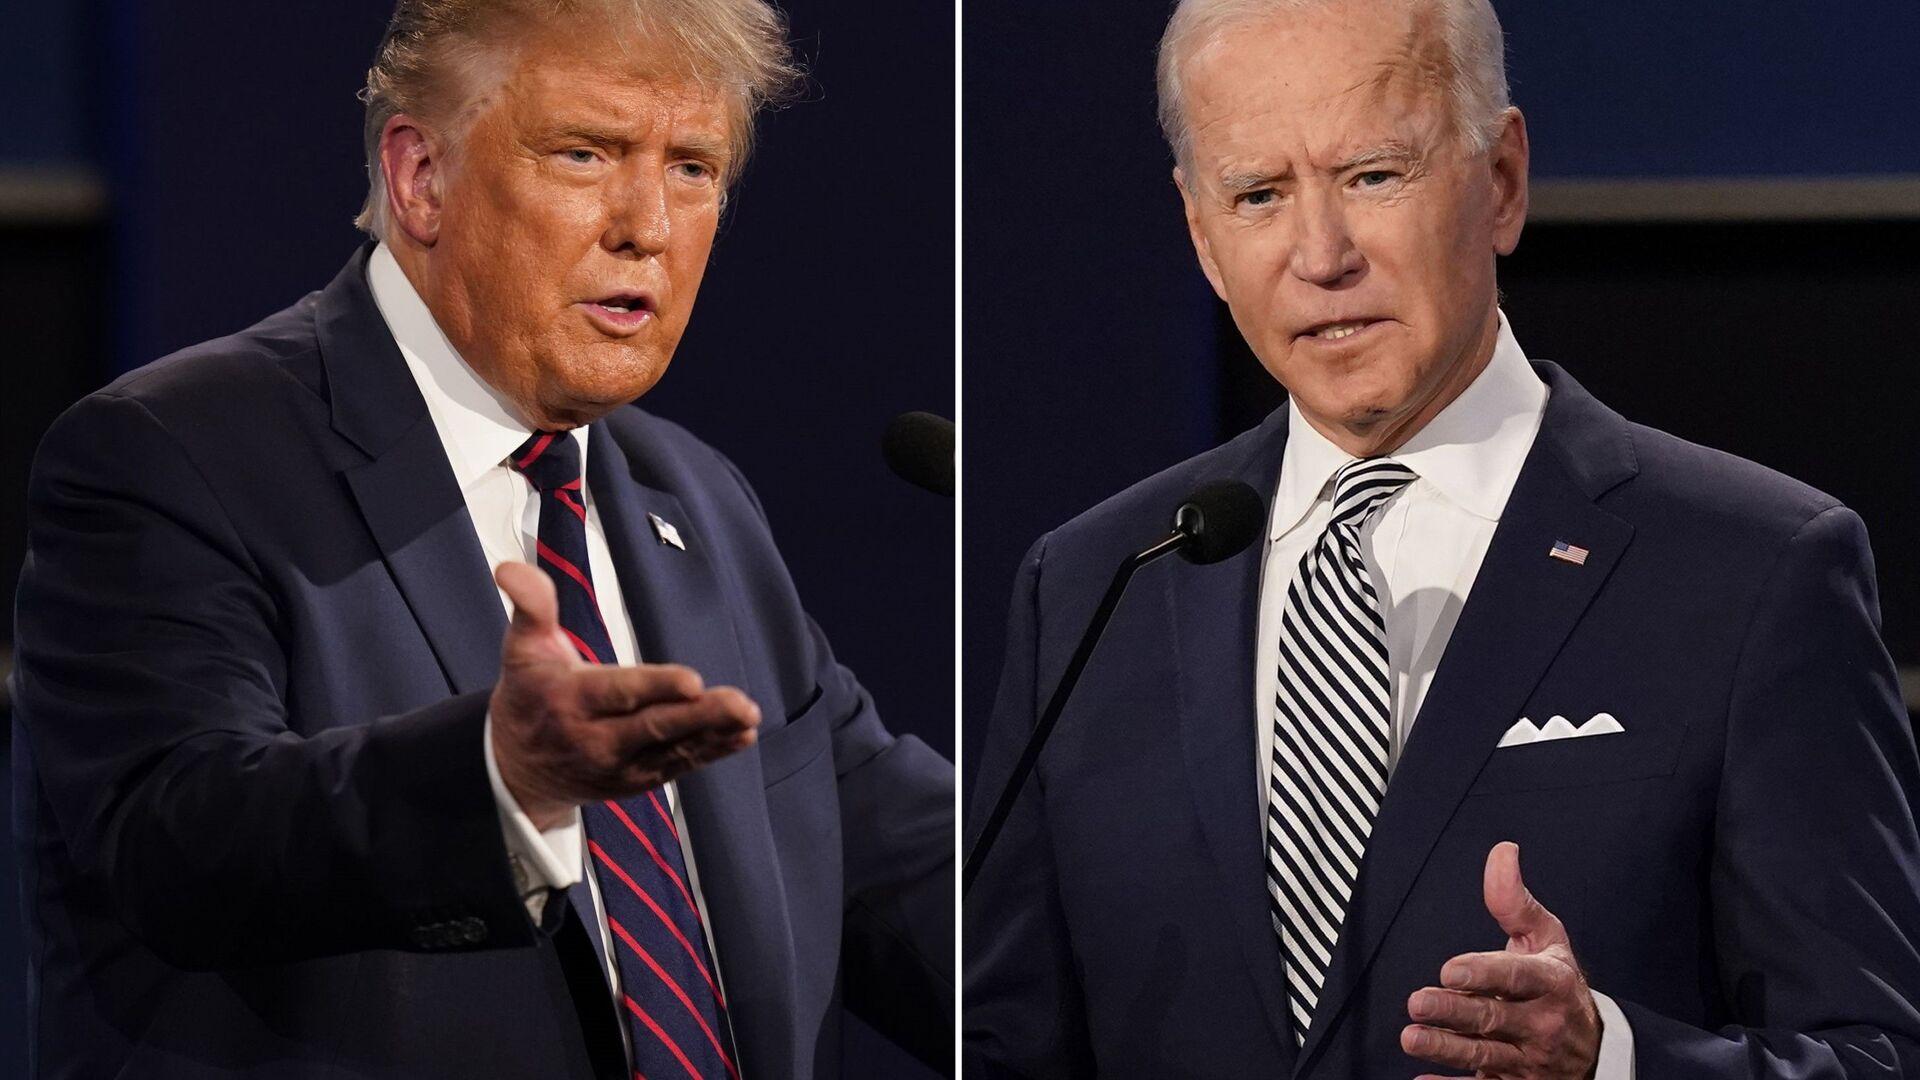 Scontro tra Joe Biden e Donald Trump - Sputnik Italia, 1920, 18.05.2021